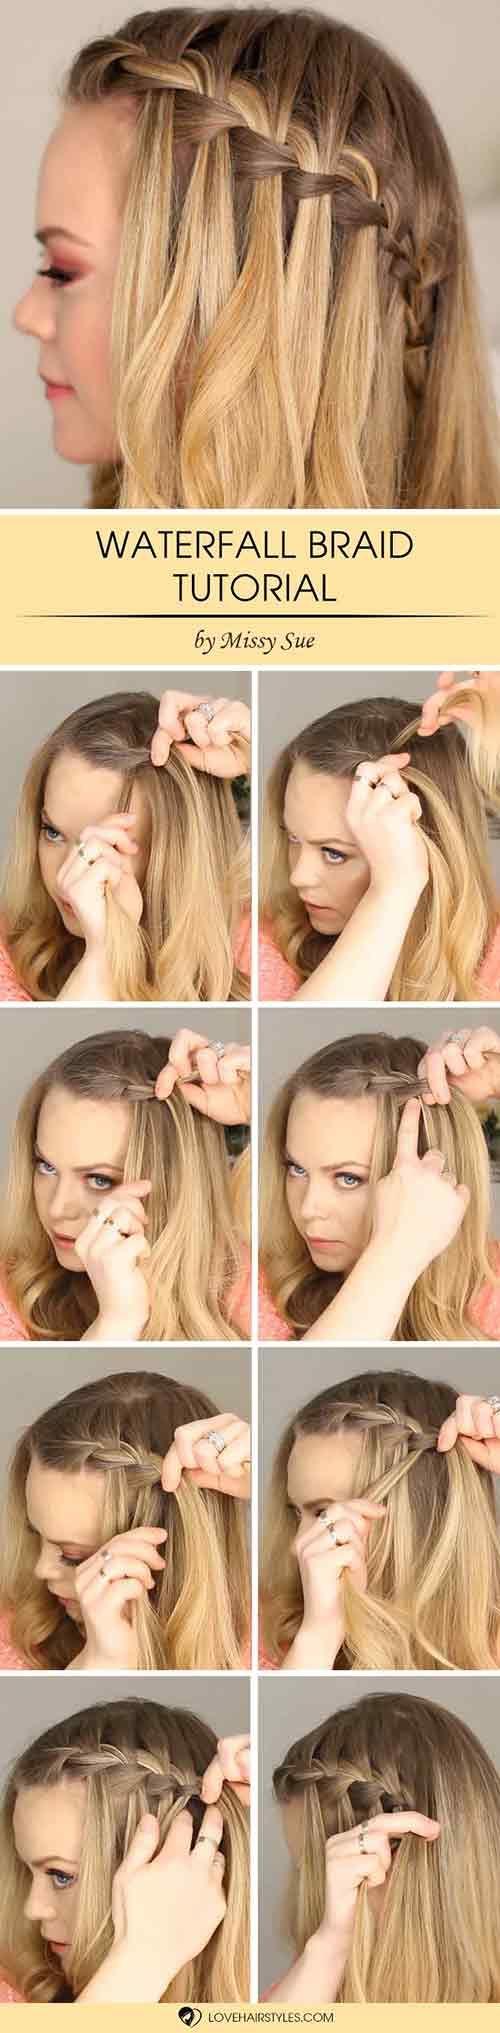 Best 25  Types of braids ideas on Pinterest | Types of hair braids ...